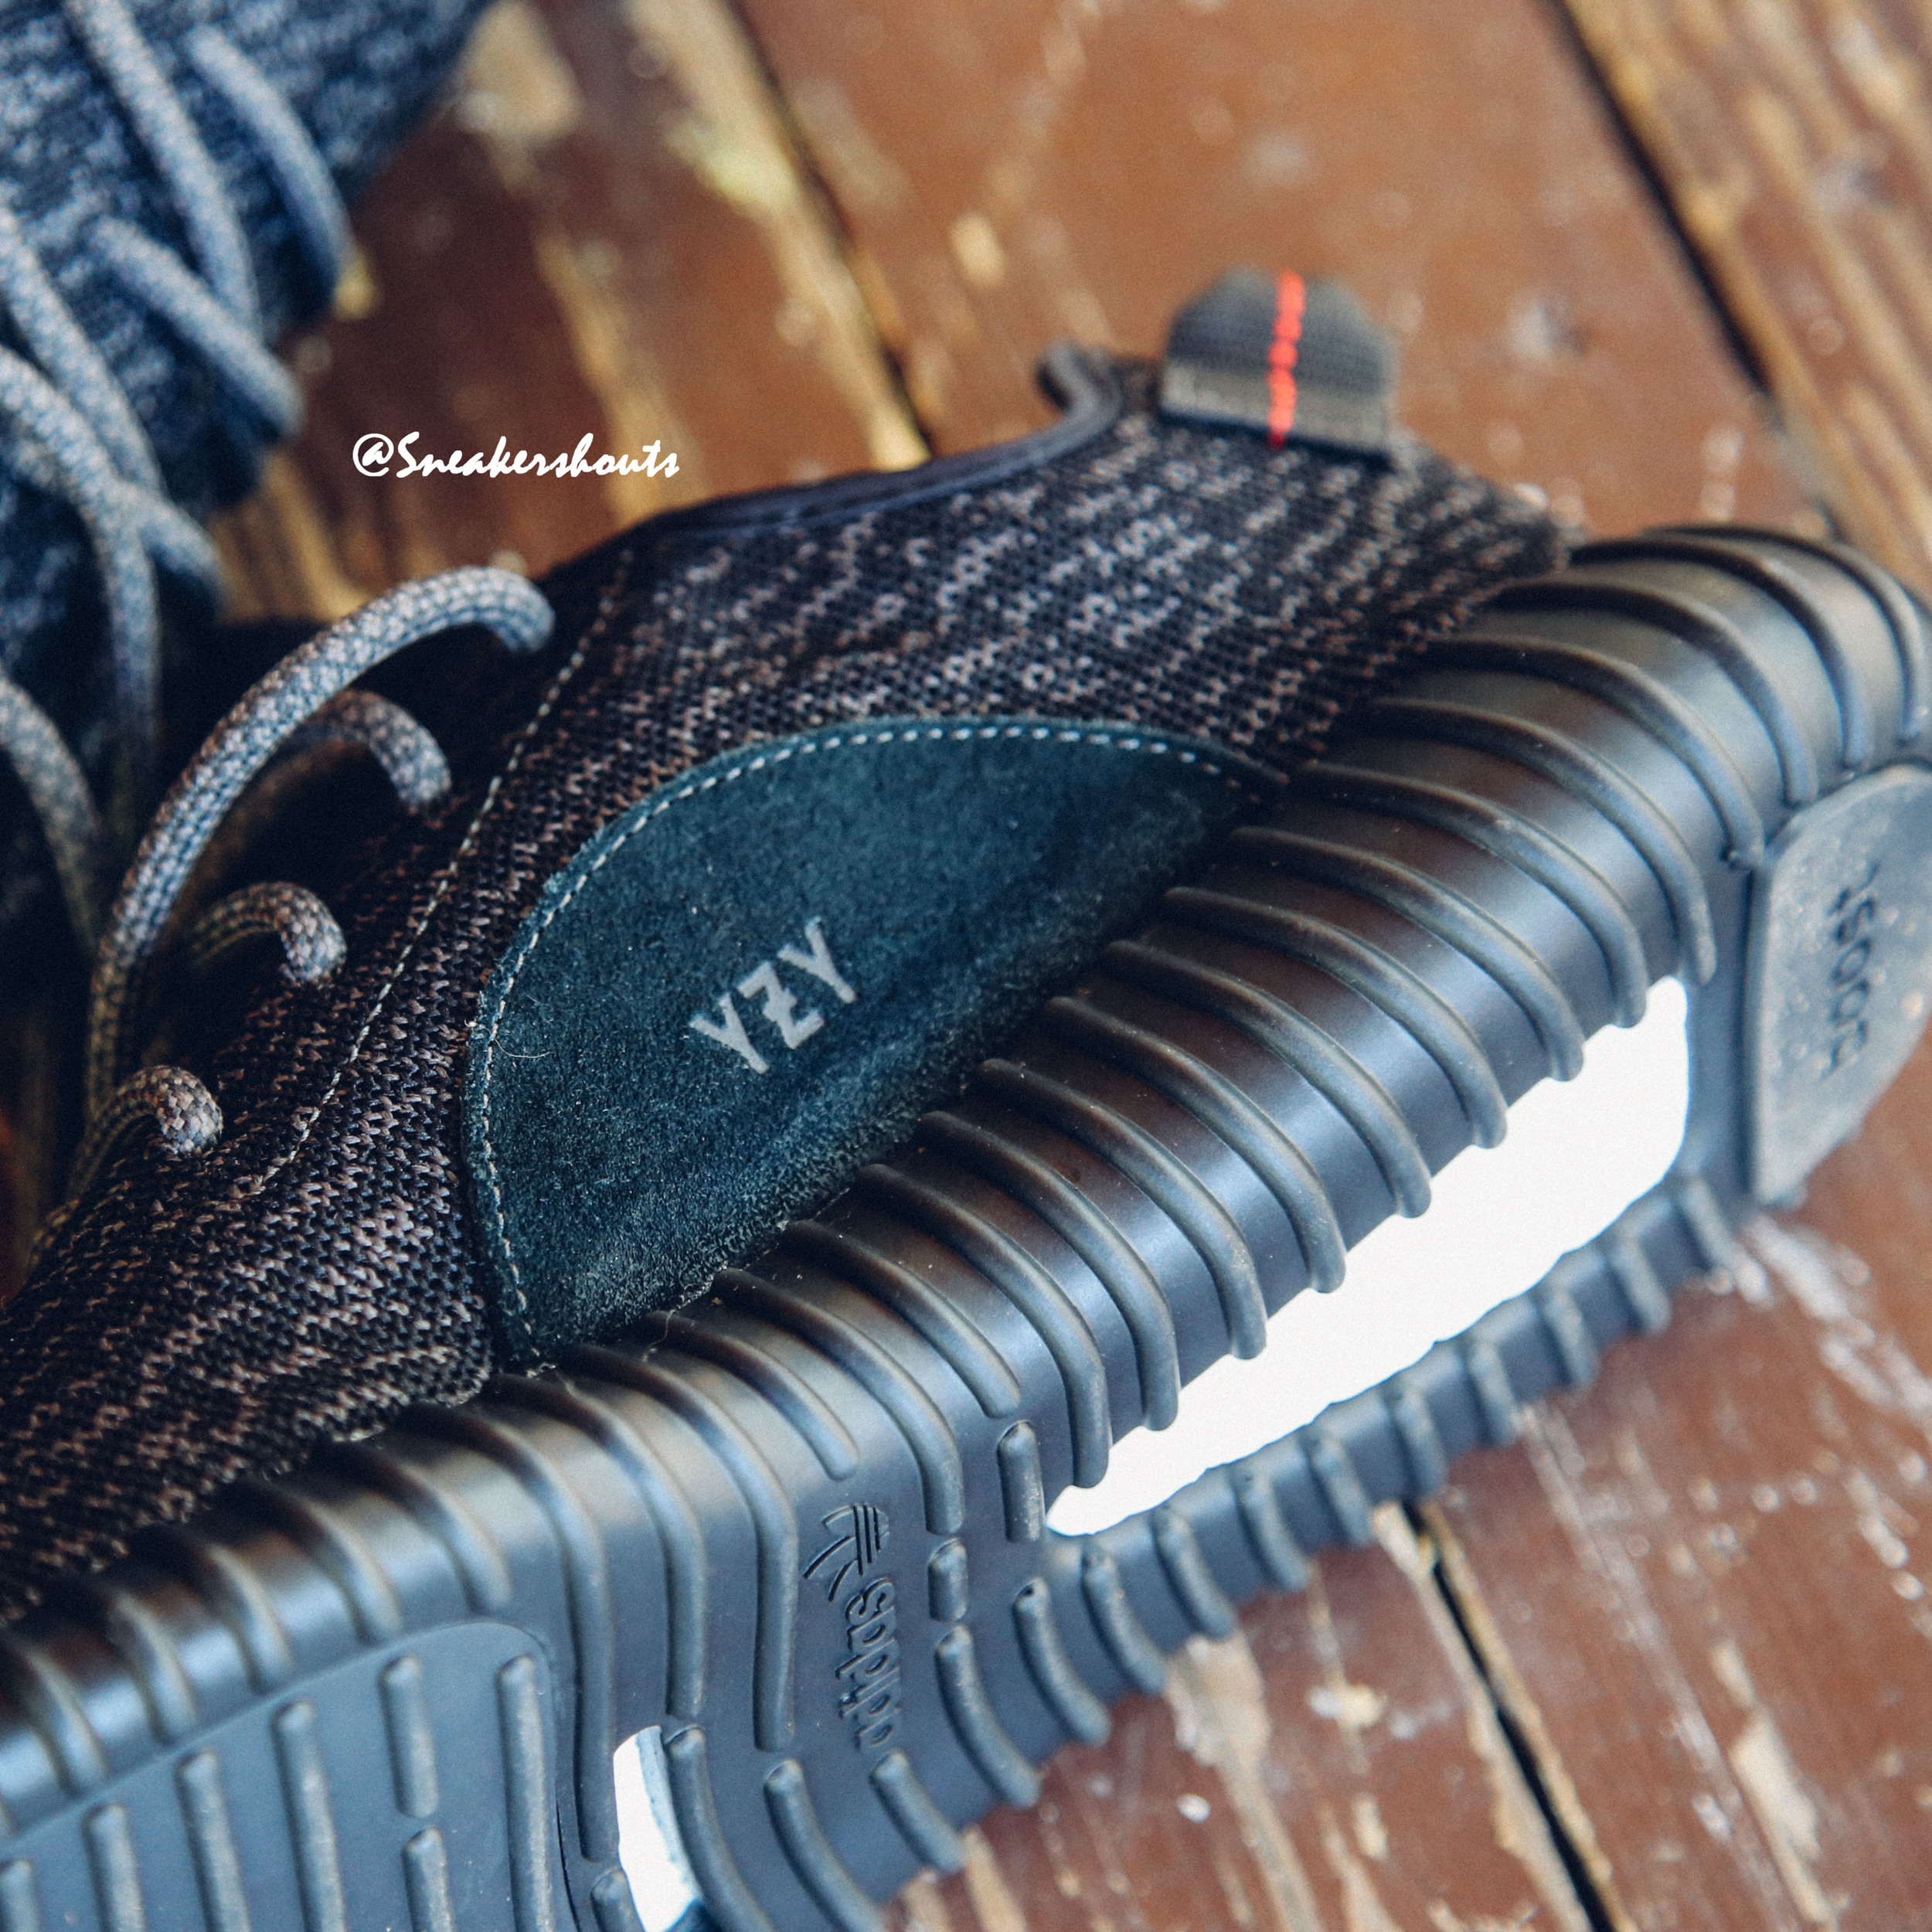 adidas yeezy 350 boost pirate black 2016 adidas yeezy boost 350 v2 online